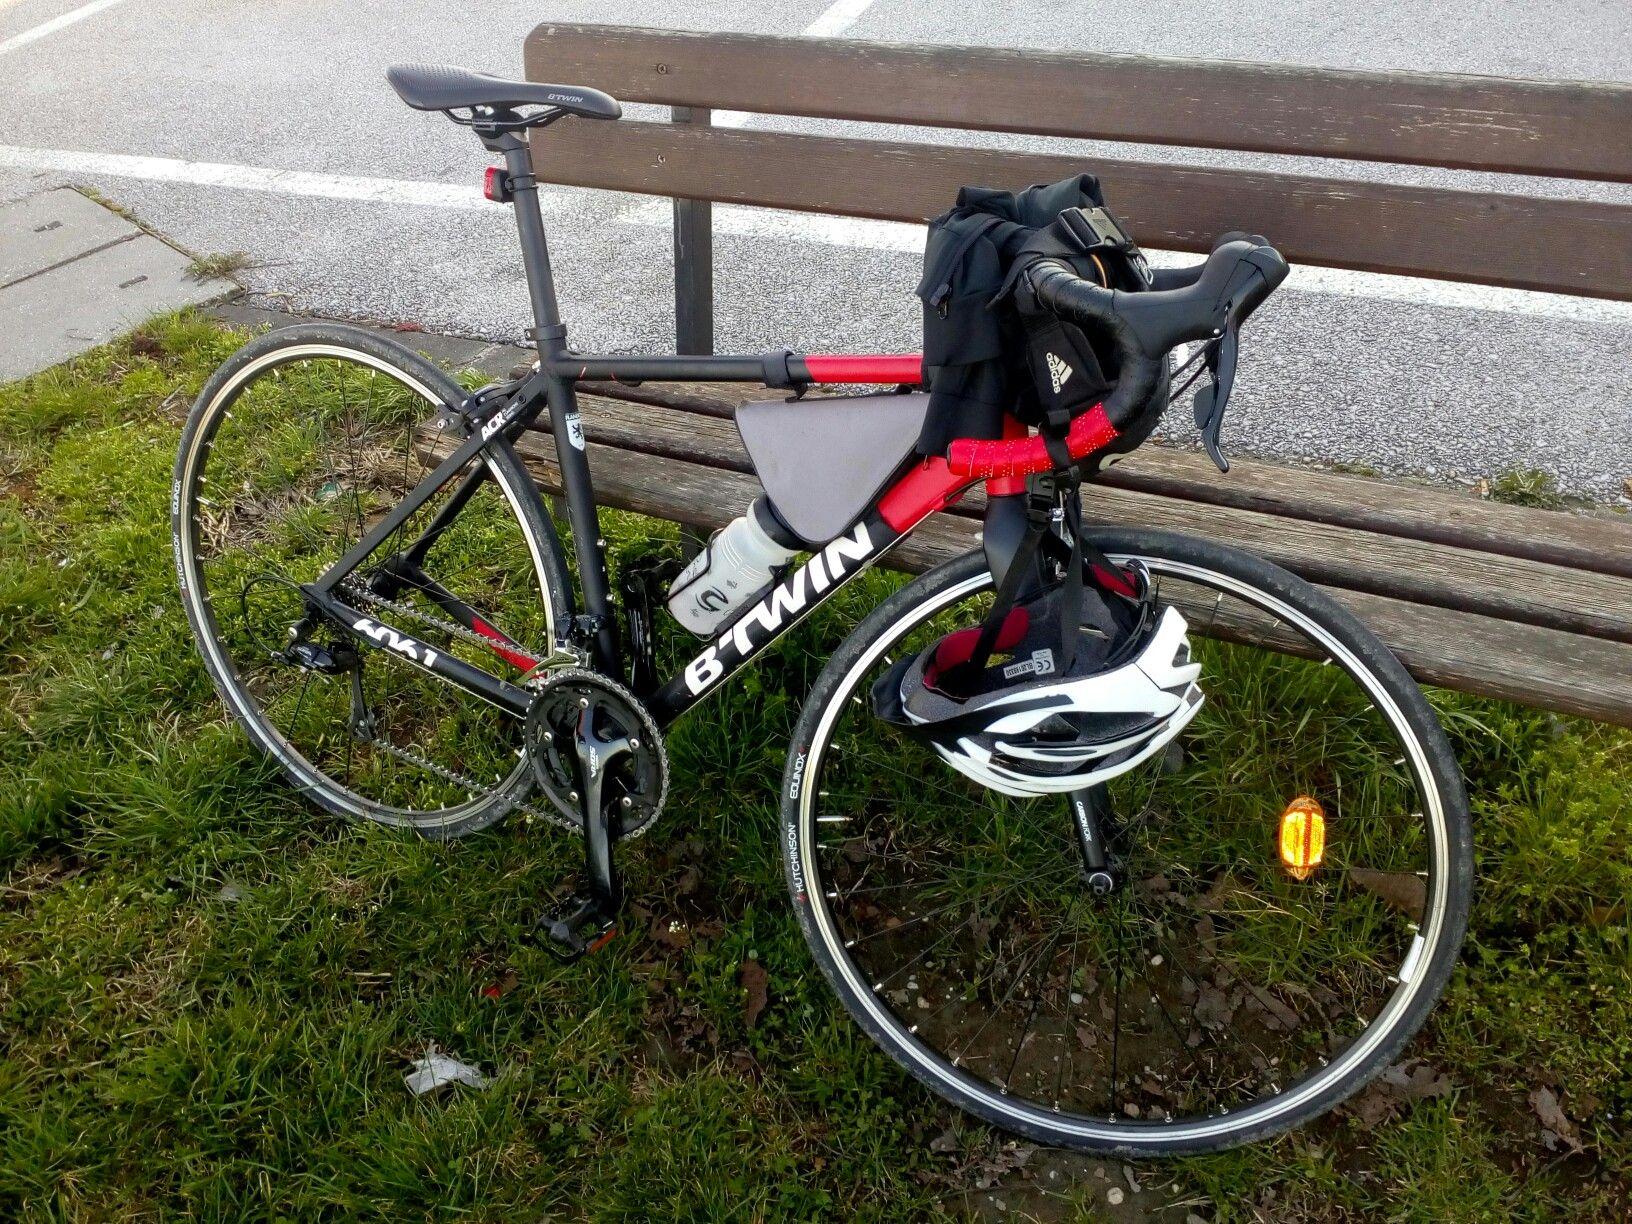 Btwin triban 520 | Mooi,,!!,!, | Bicycle, Bike, Cycling